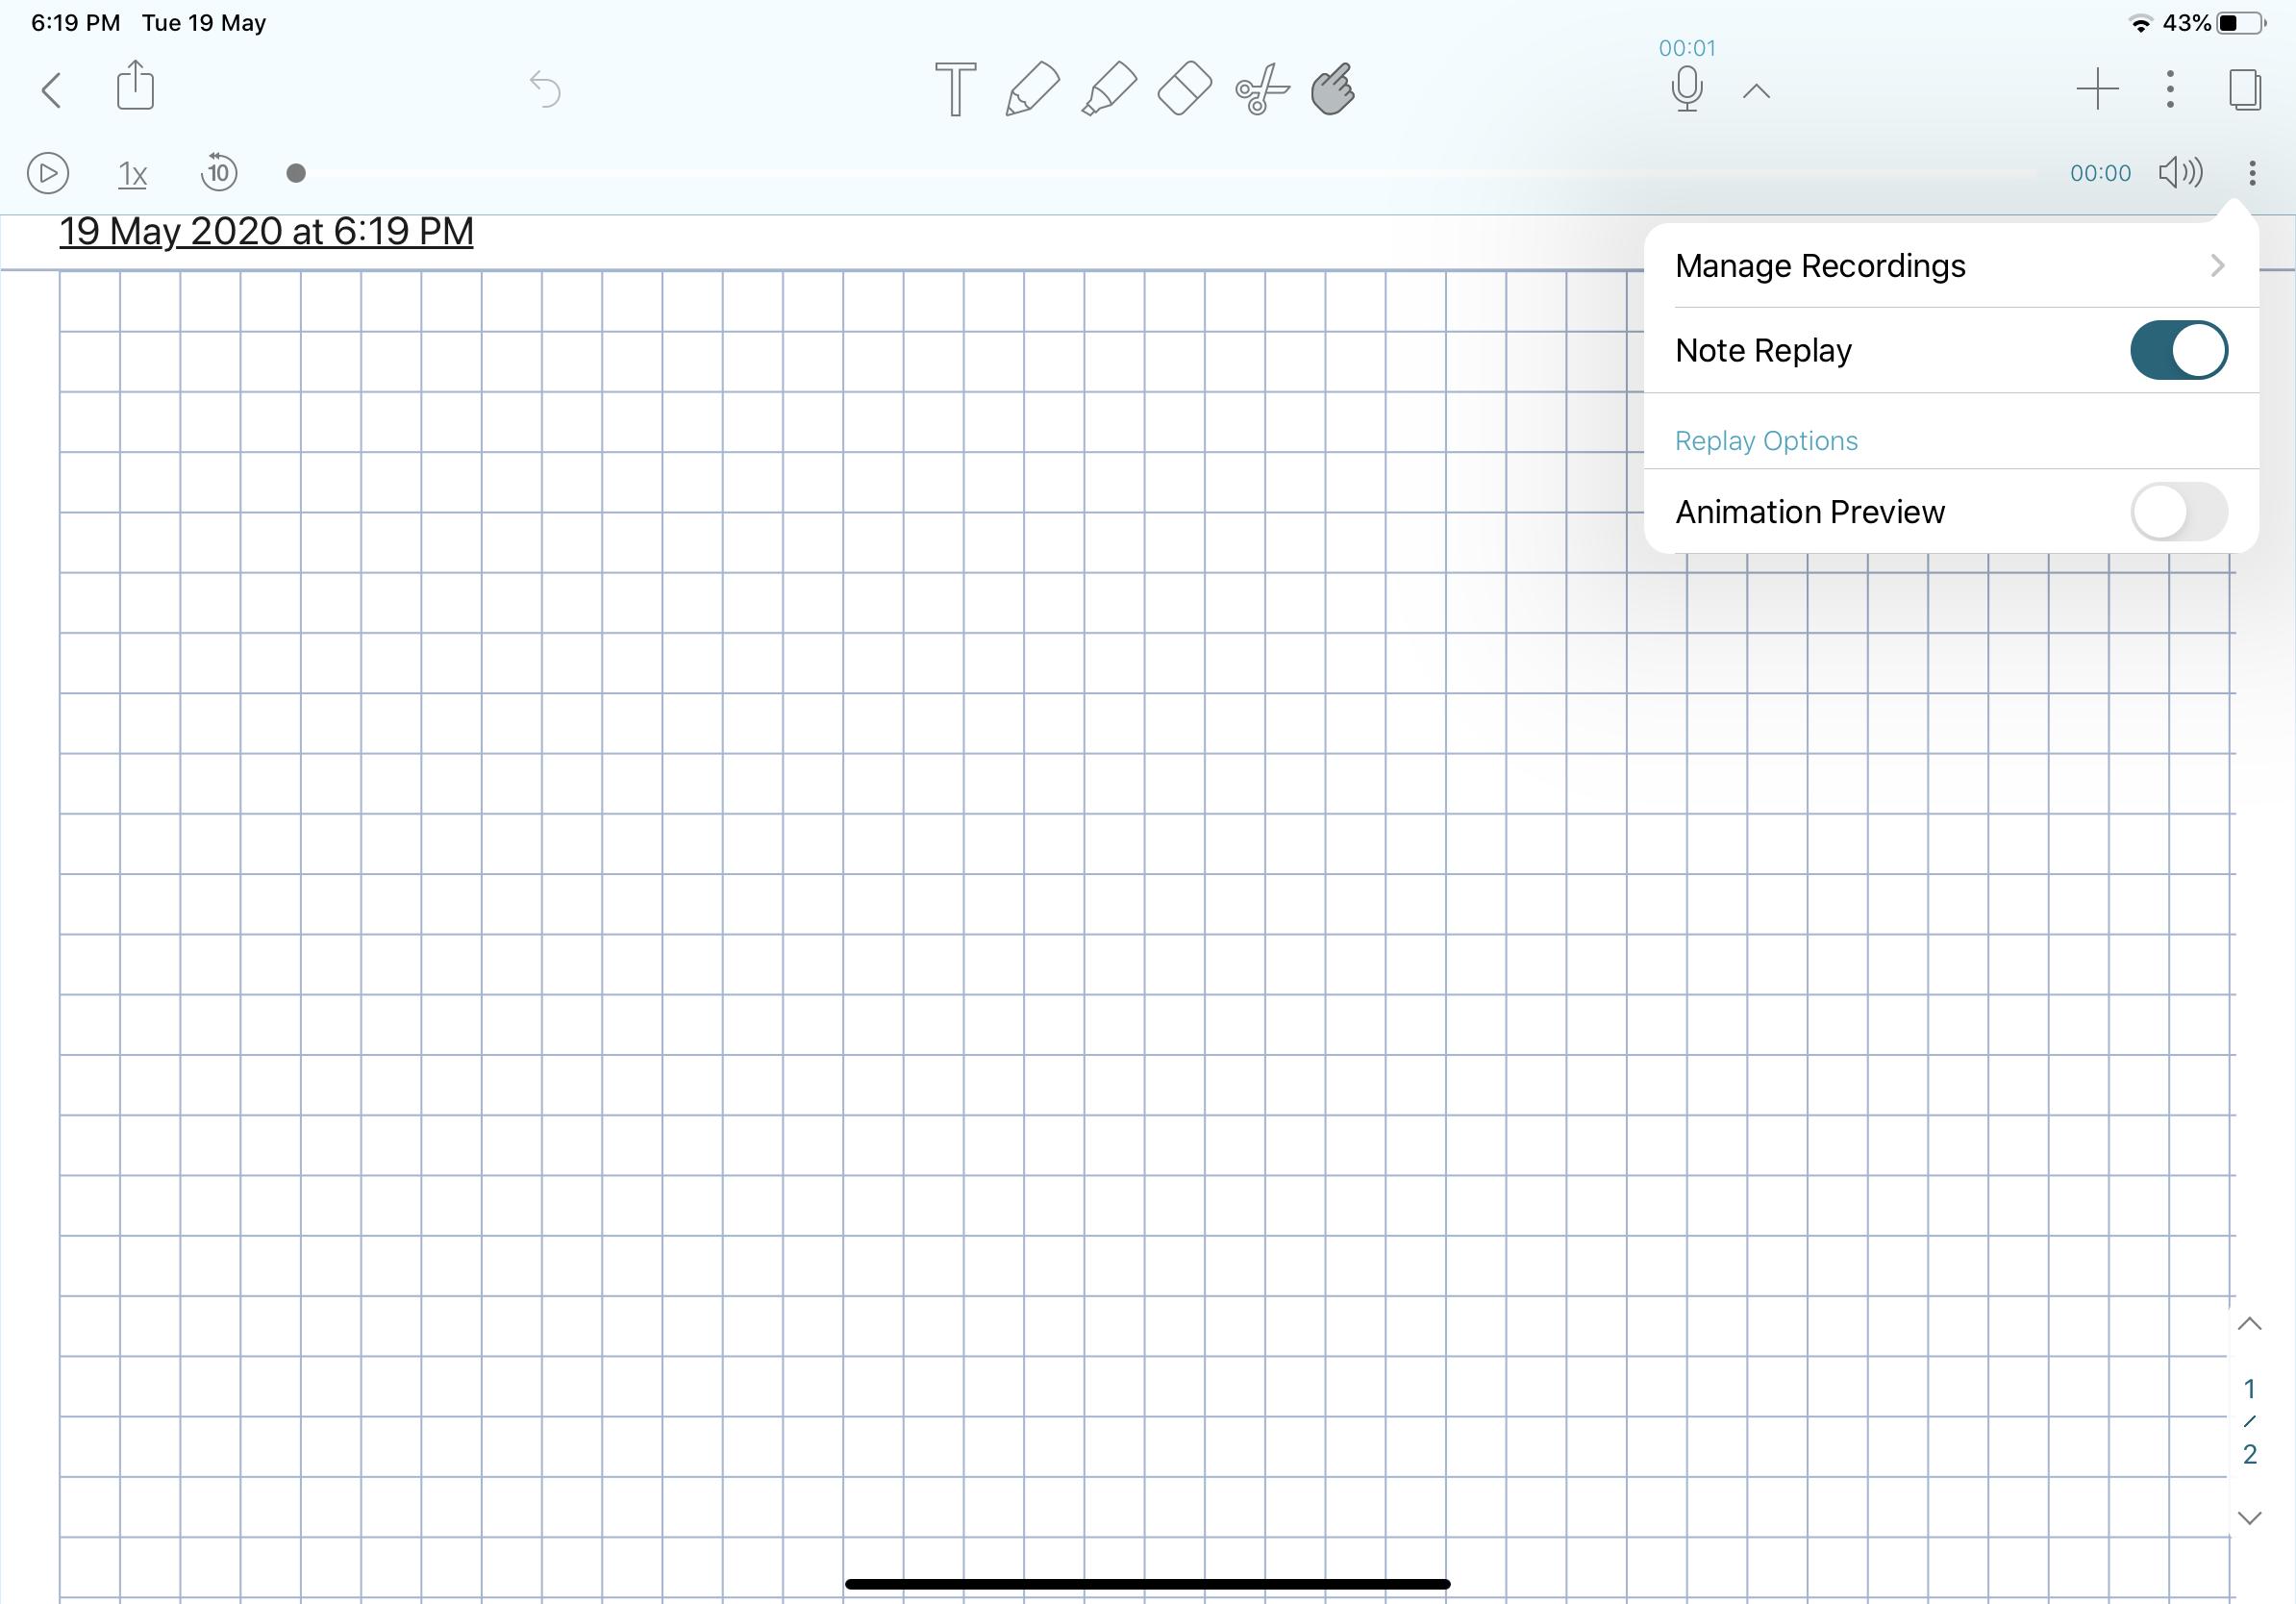 2020 notability walkthrough; Notability Record Feature